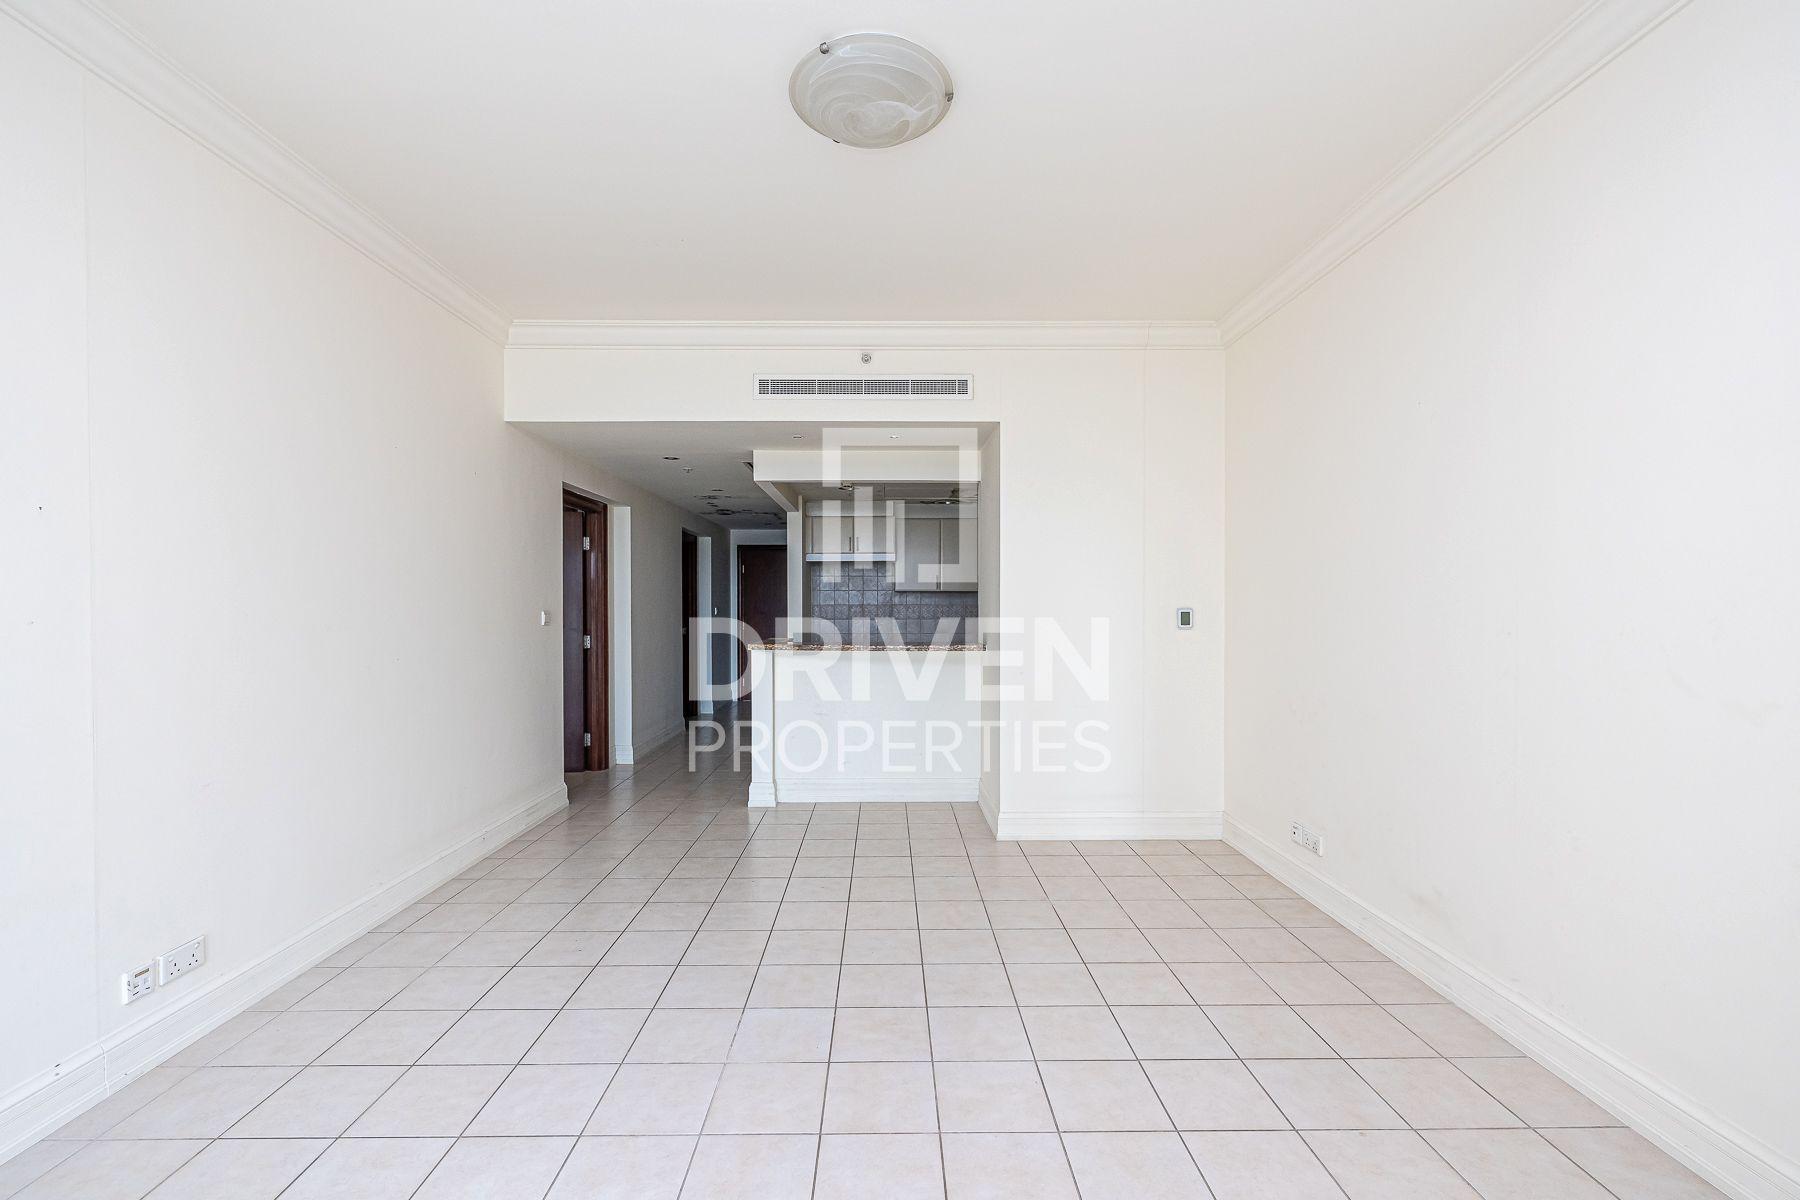 Apartment for Rent in Al Mesk Tower - Dubai Marina